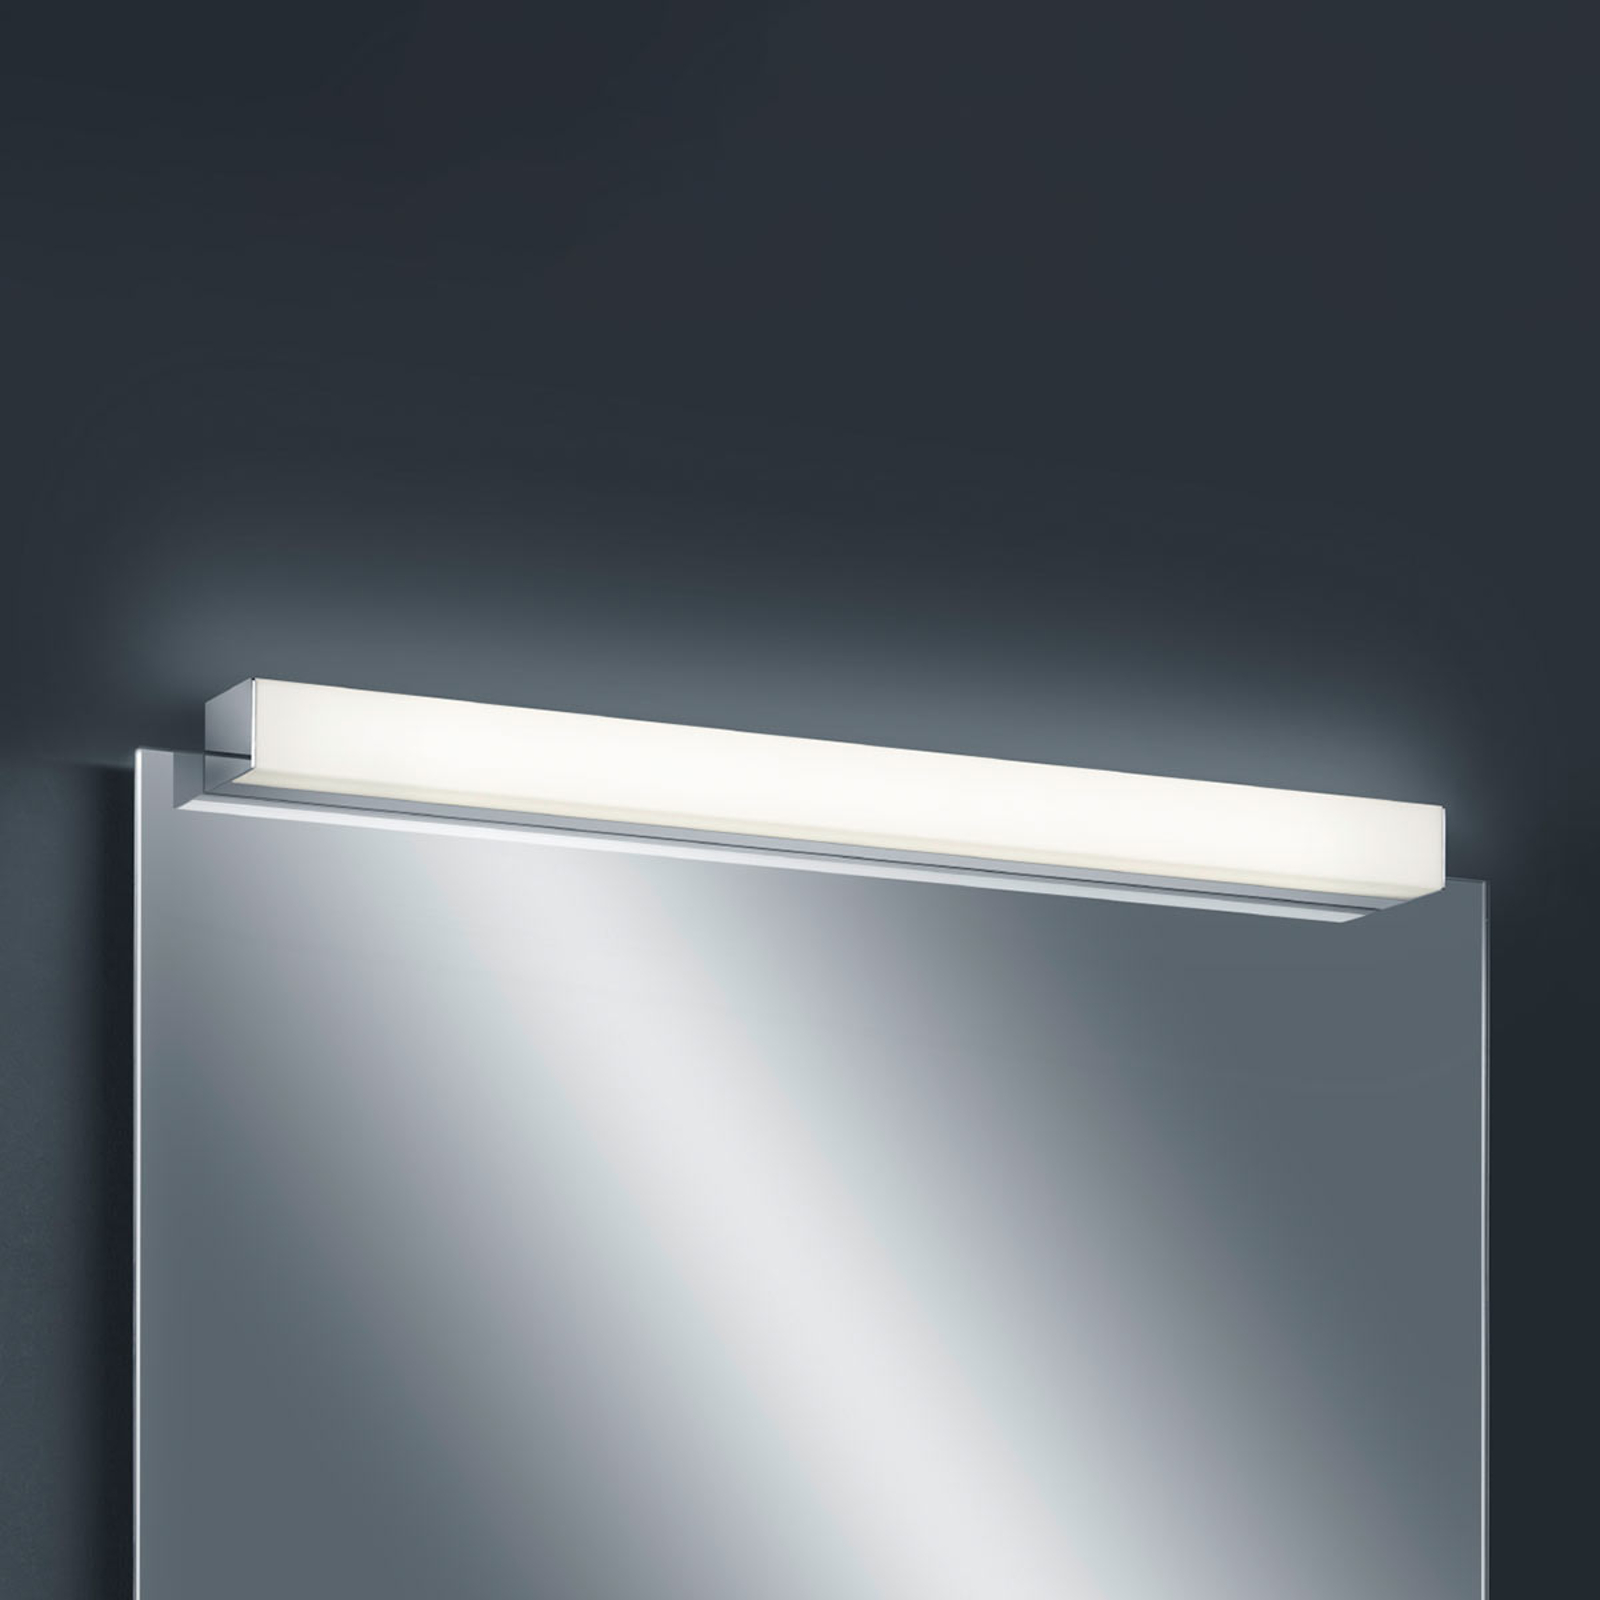 Helestra Lado - LED-spejllampe 60 cm